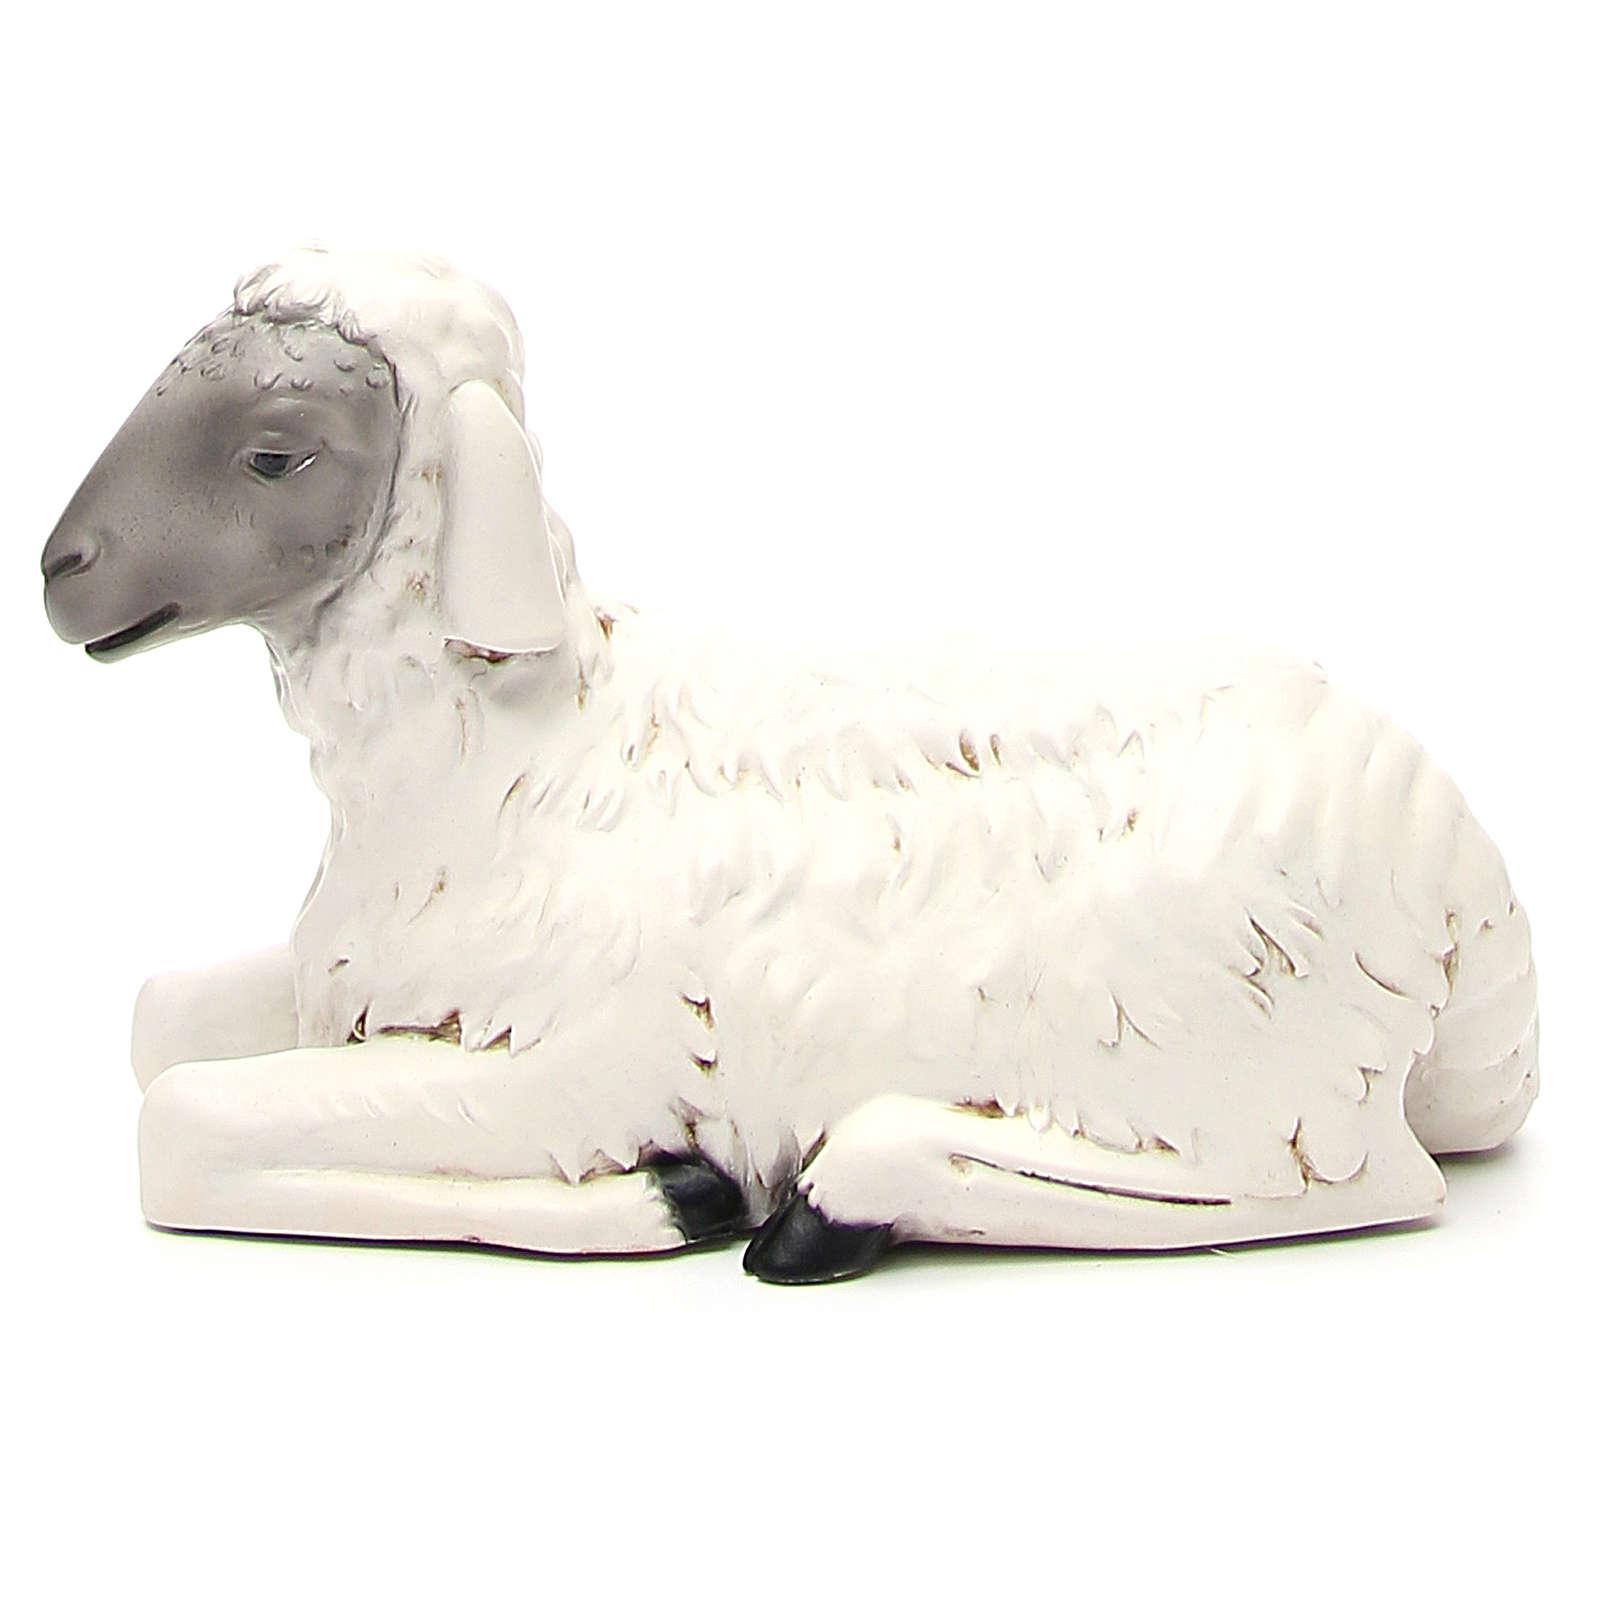 Statua pecorella per presepe 65 cm 3